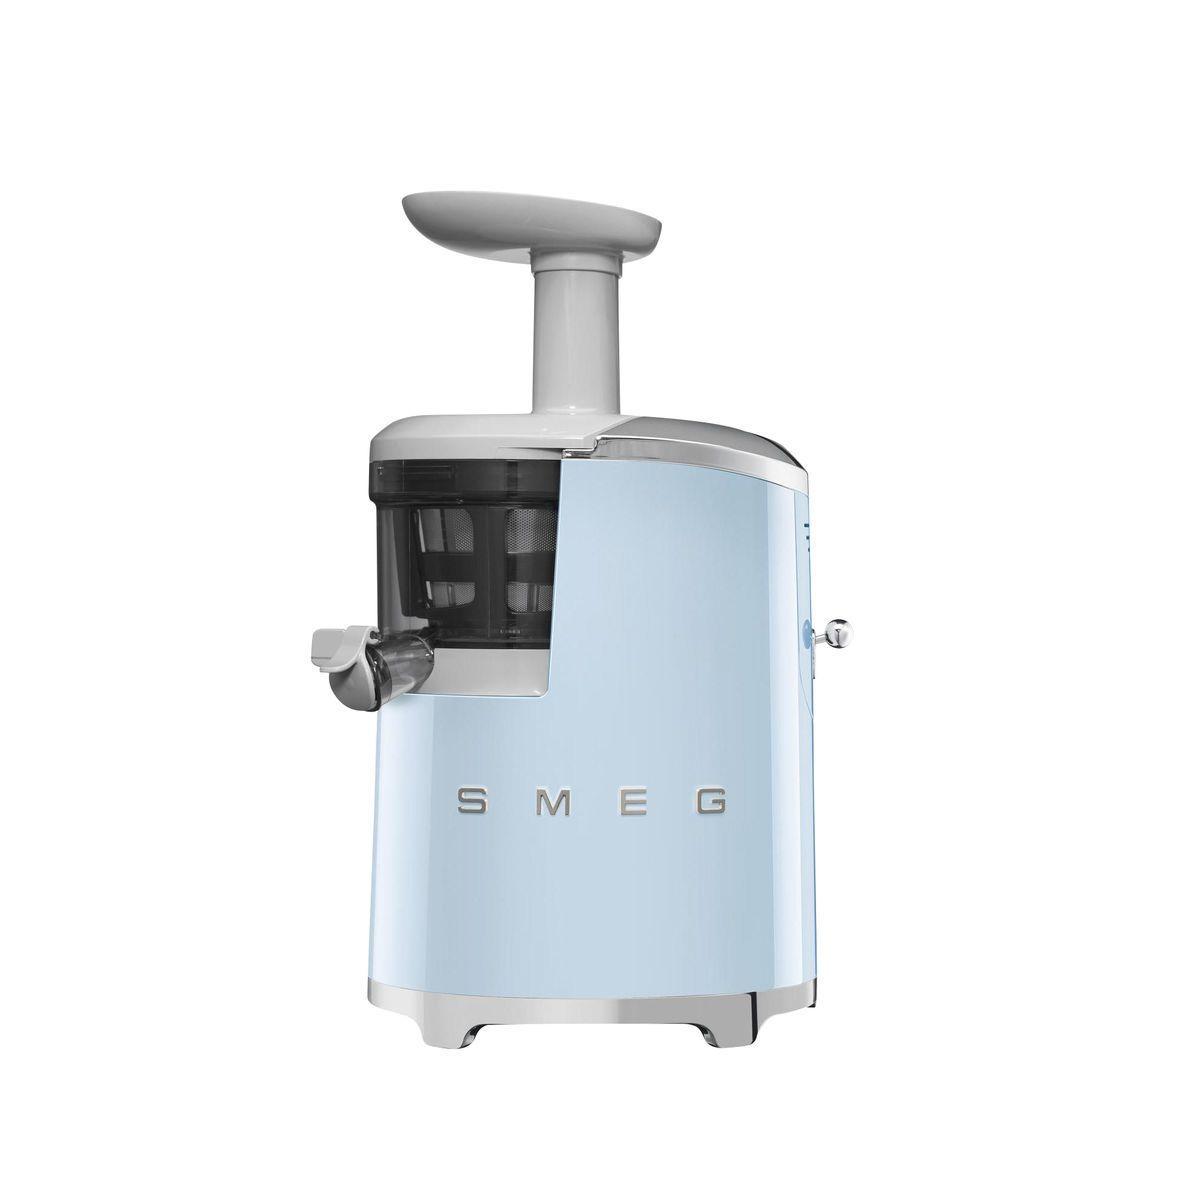 Smeg Slow Juicer Erfahrungen : SJF01 Slow Juicer Smeg Smeg Consumer Products AmbienteDirect.com